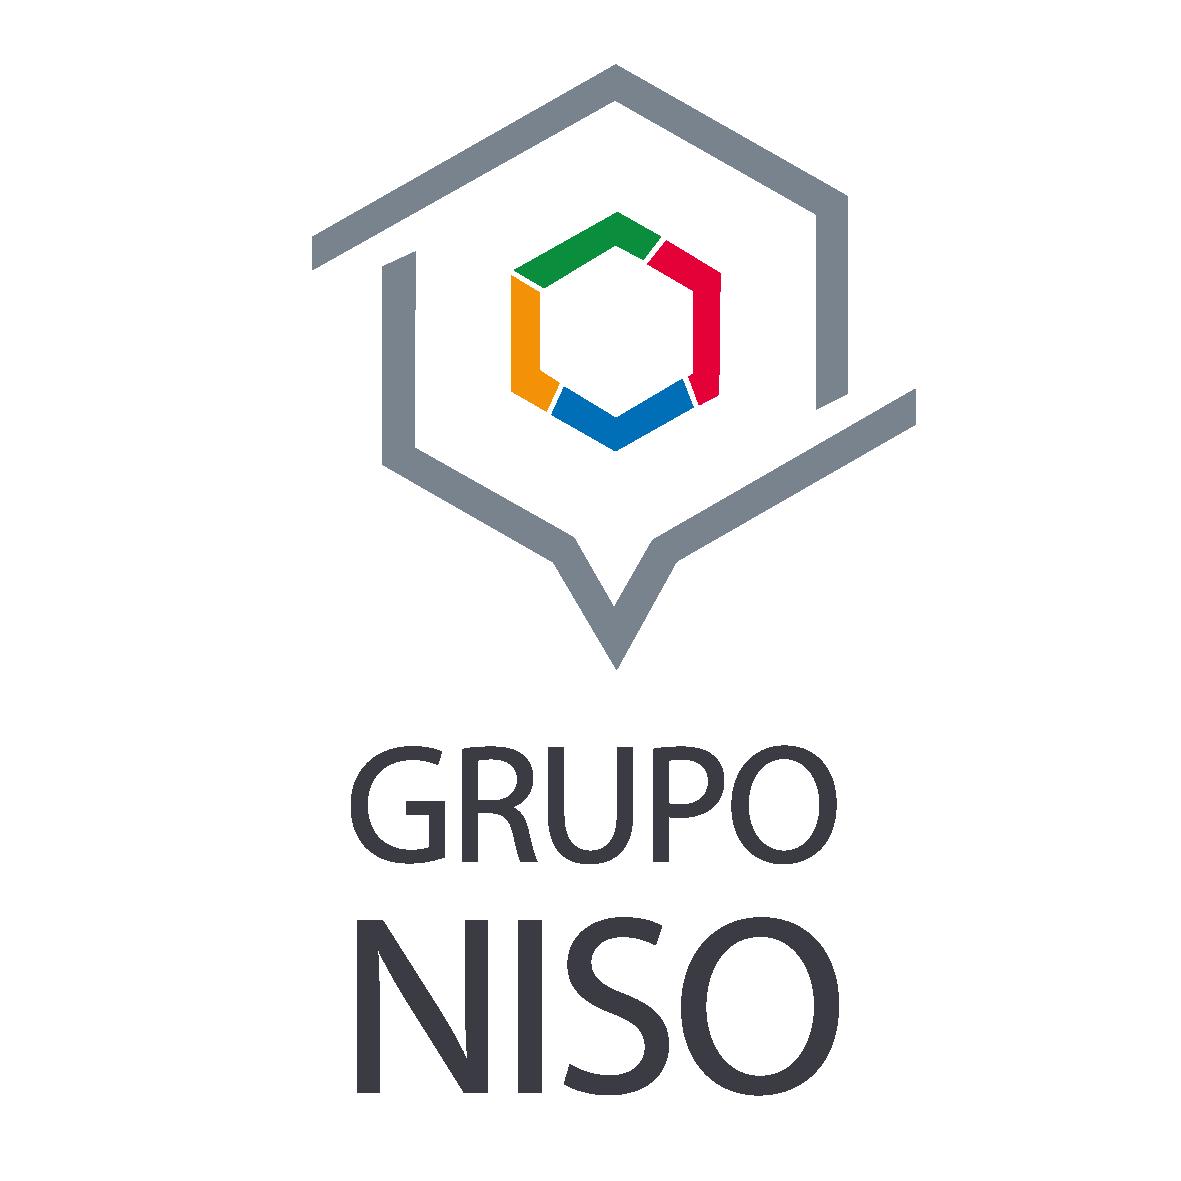 grupo Niso.png